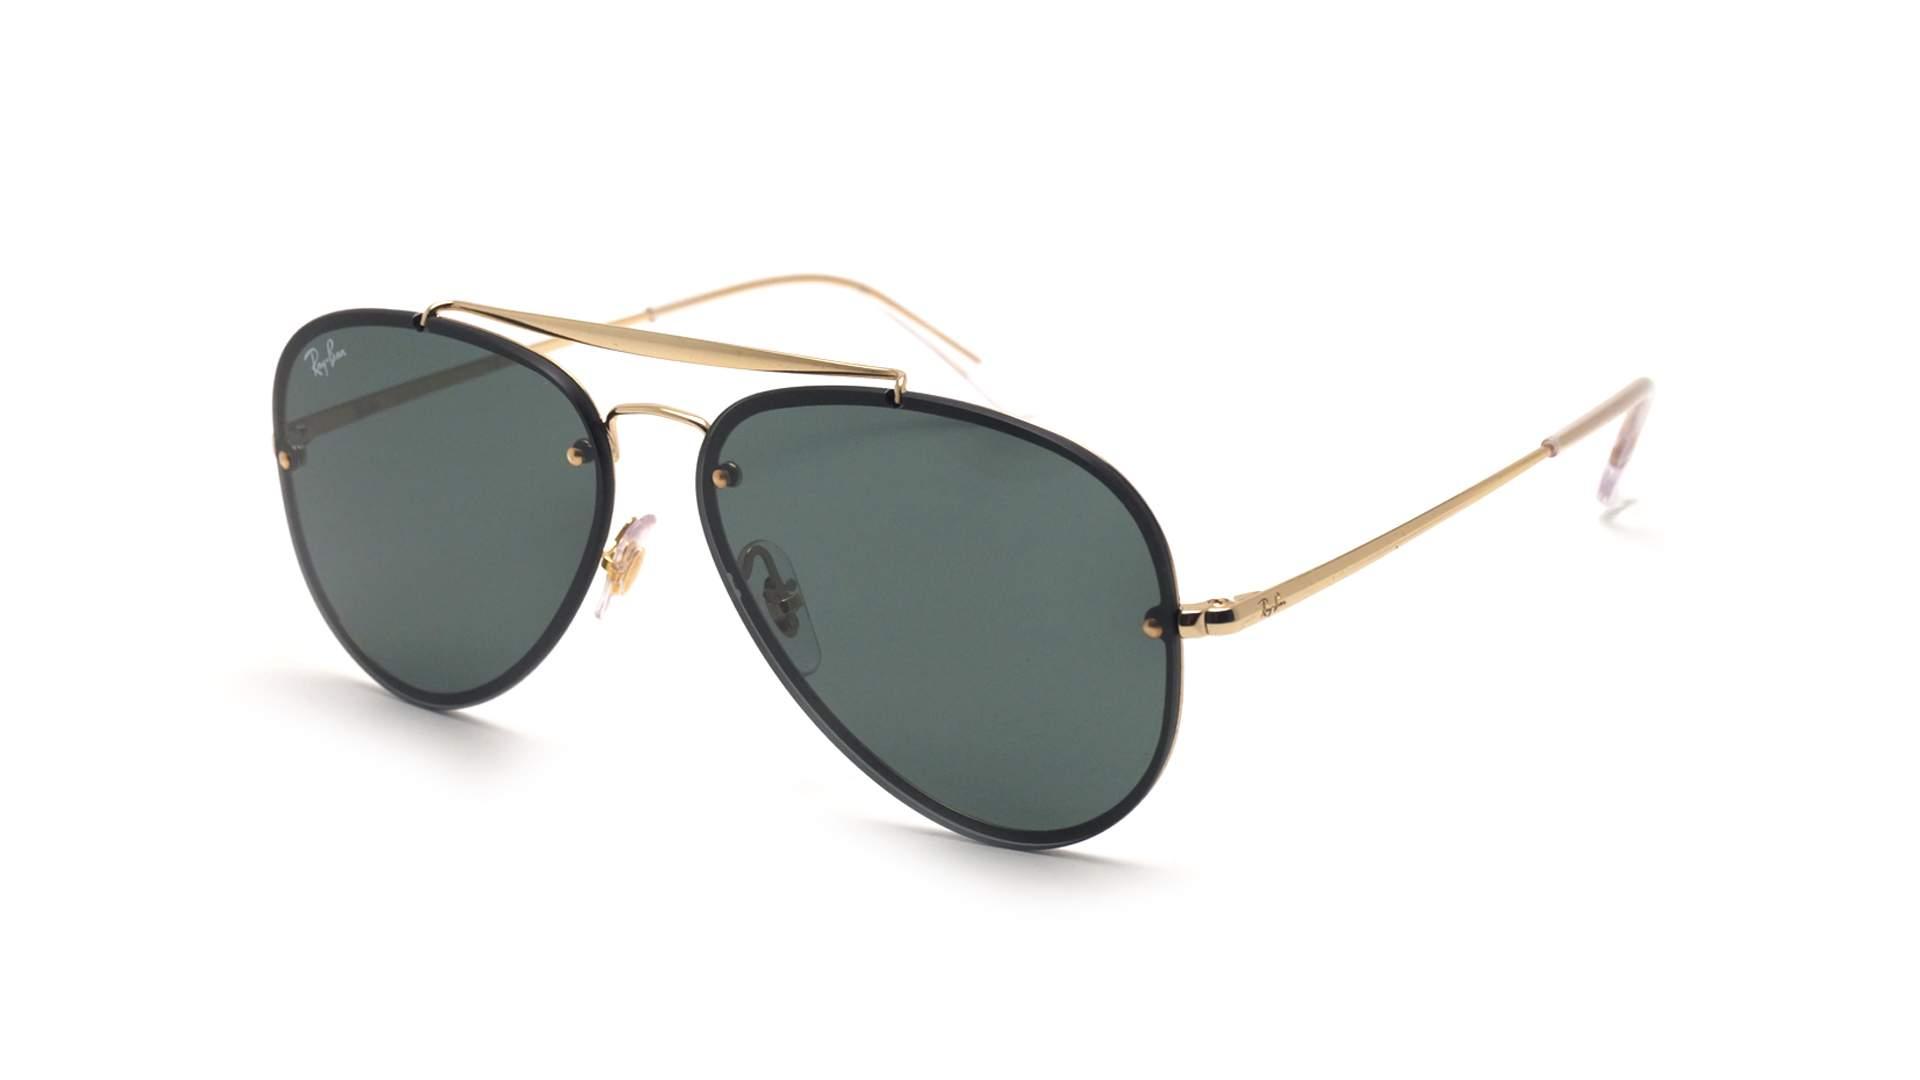 8f7bbd546fe6db Sunglasses Ray-Ban Blaze Aviator Gold RB3584N 9050 71 58-13 Medium